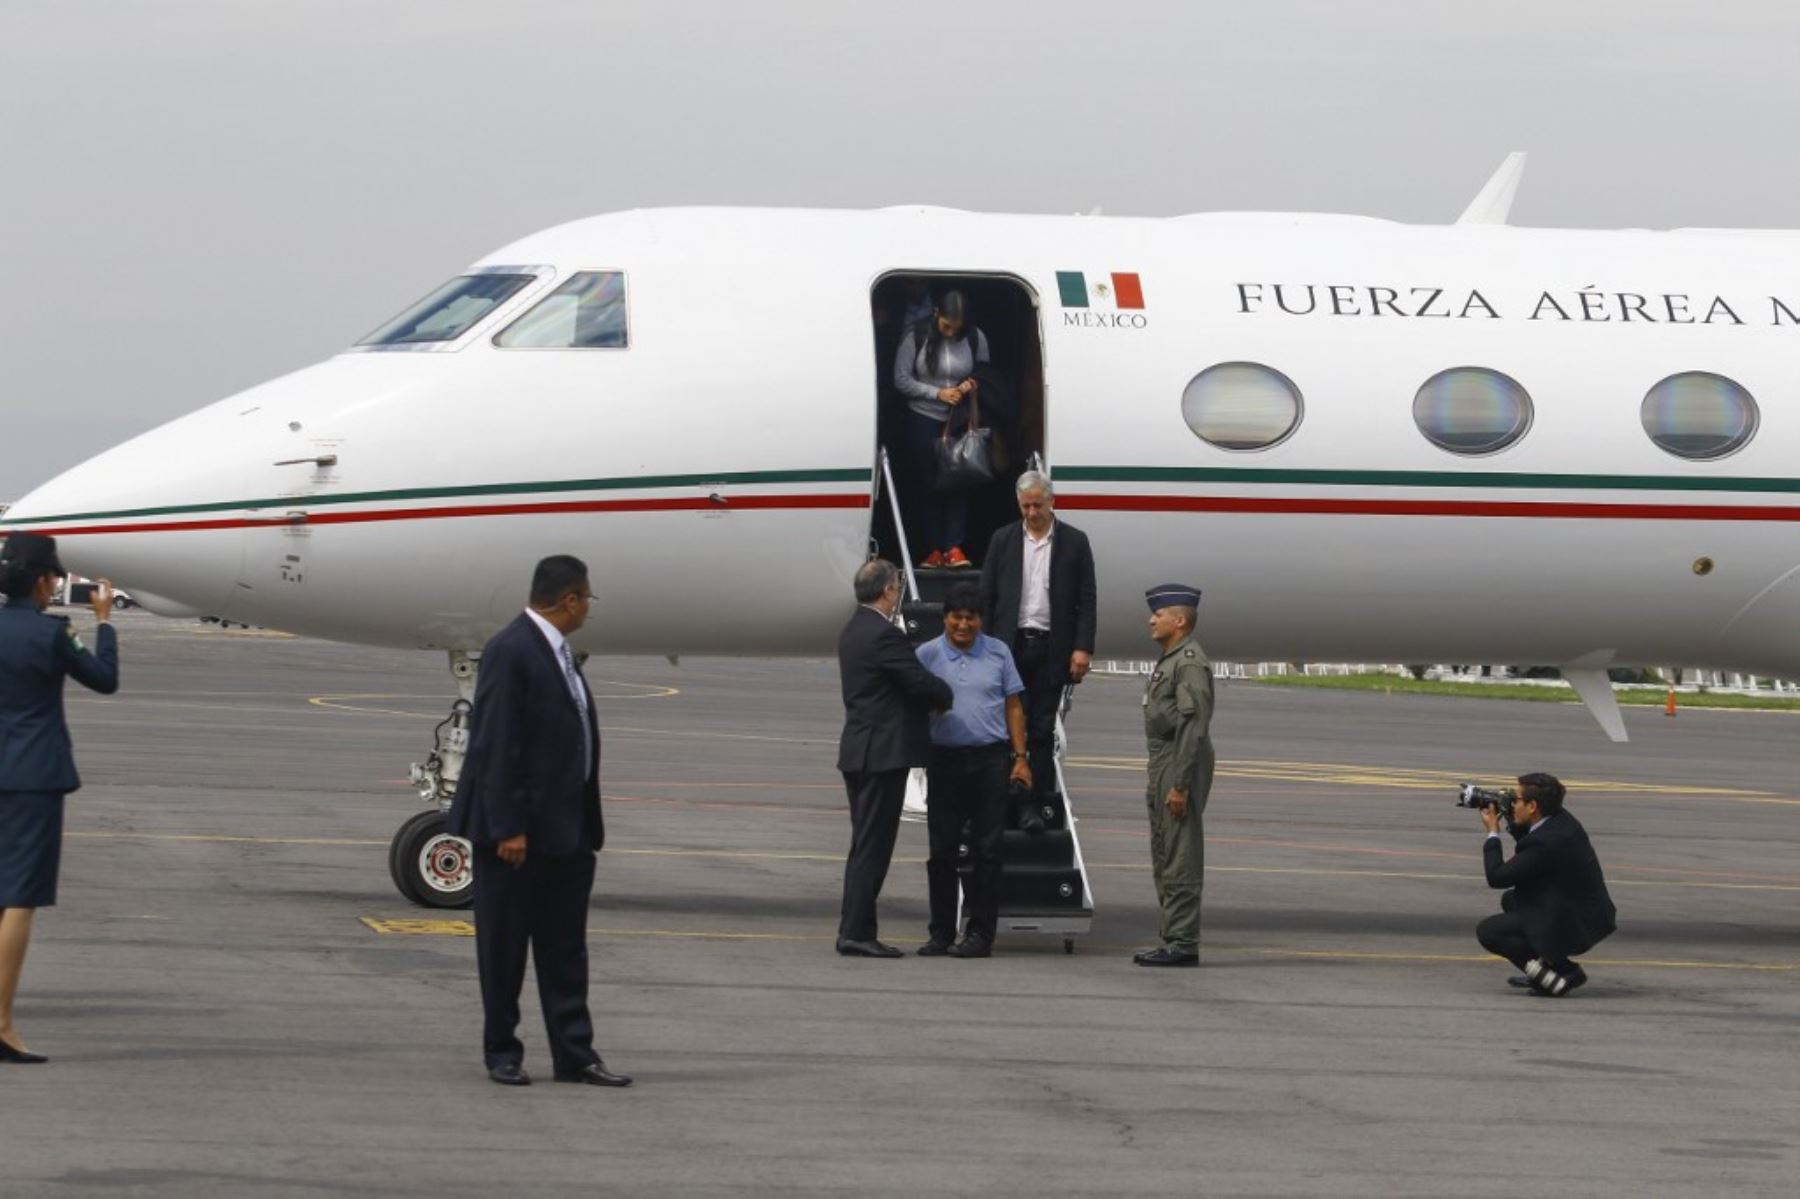 Evo Morales llega a México tras recibir asilo político. Foto: AFP